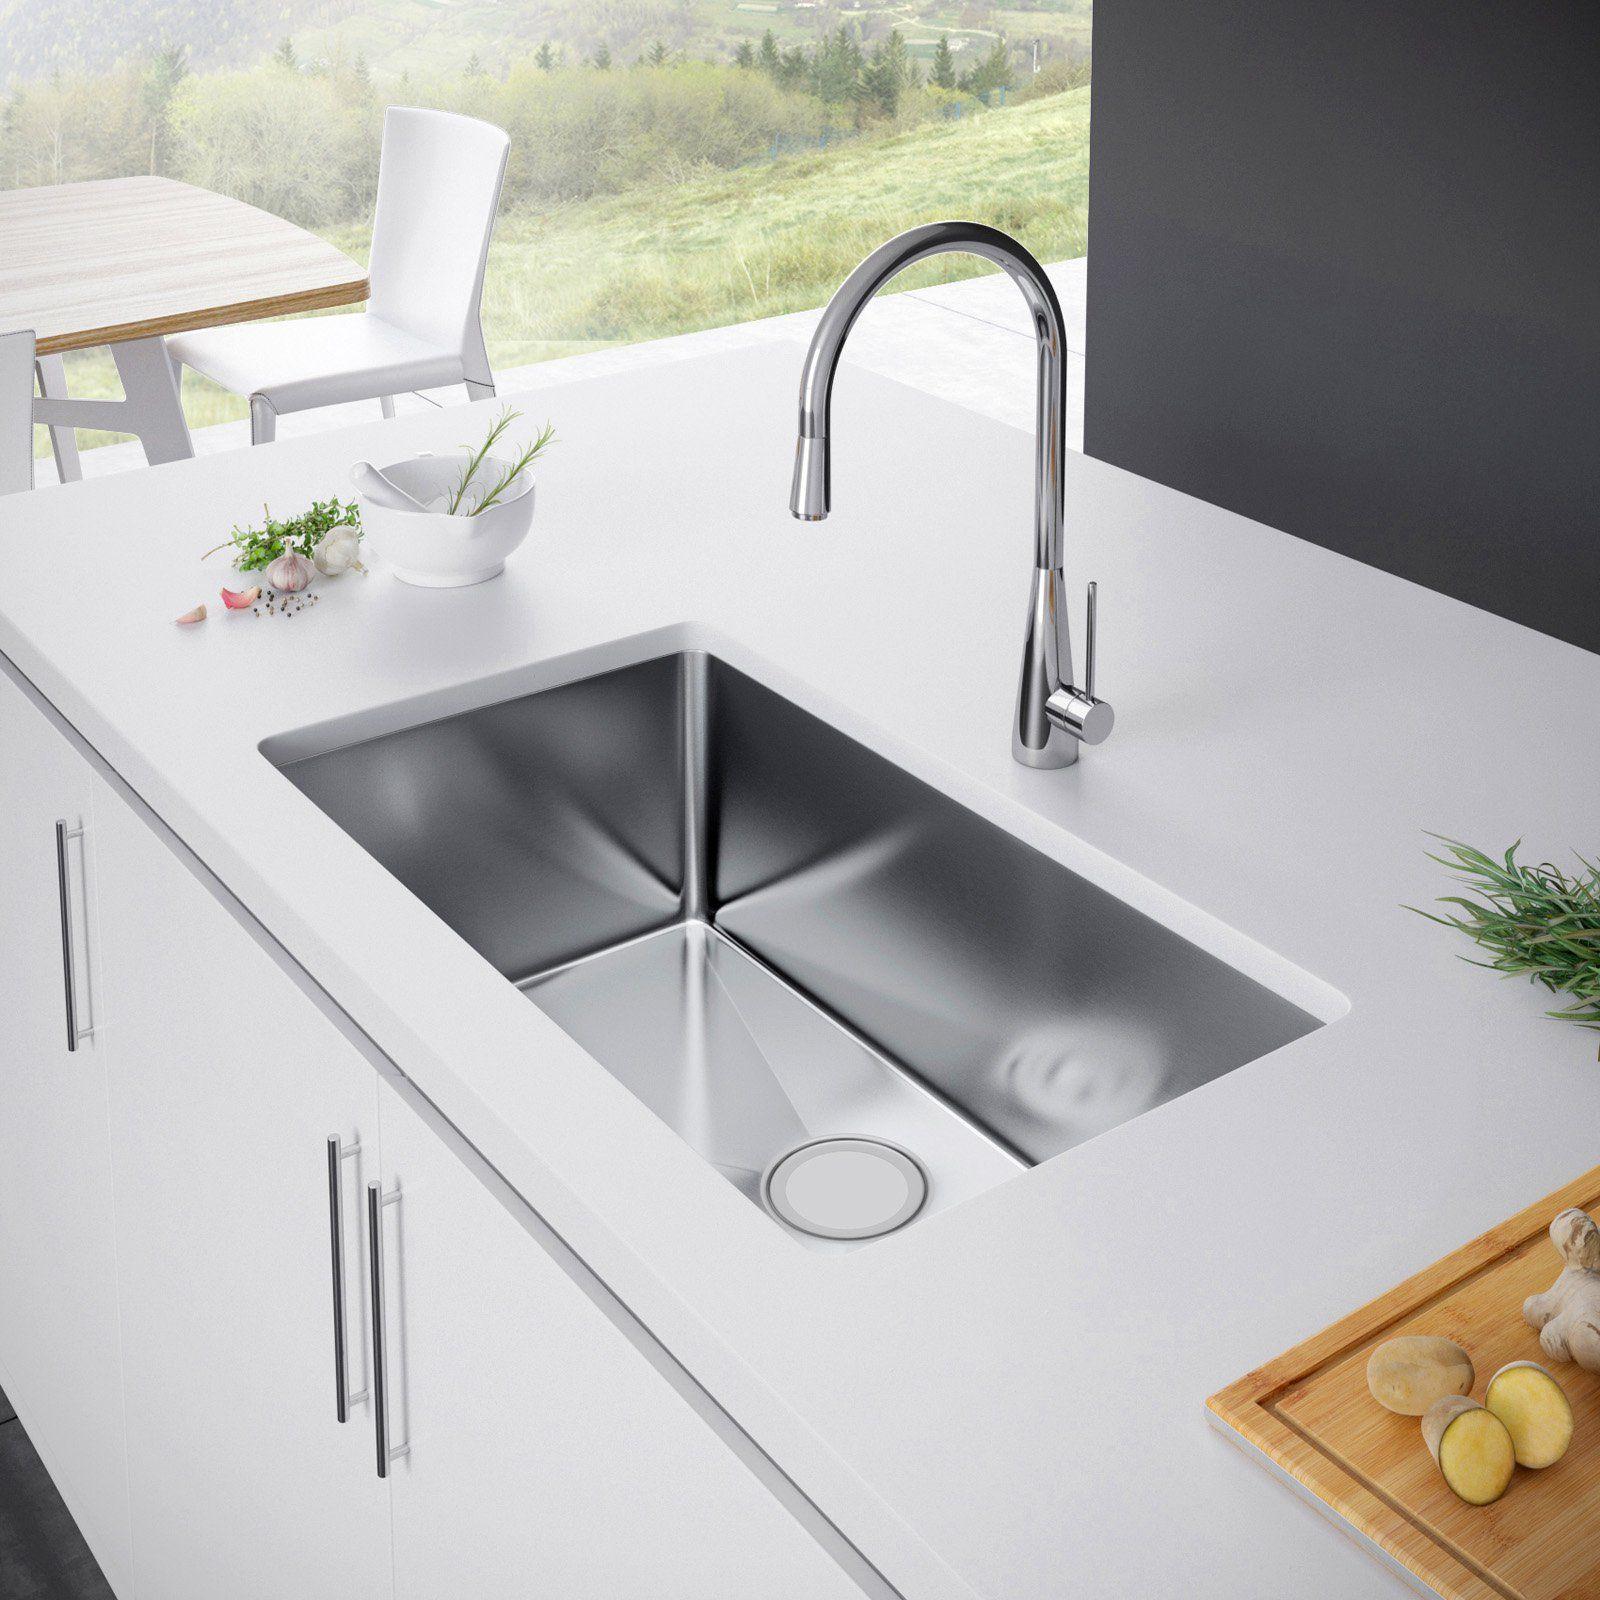 Exclusive Heritage Single Bowl Undermount Ksh 3018 S Kitchen Sink